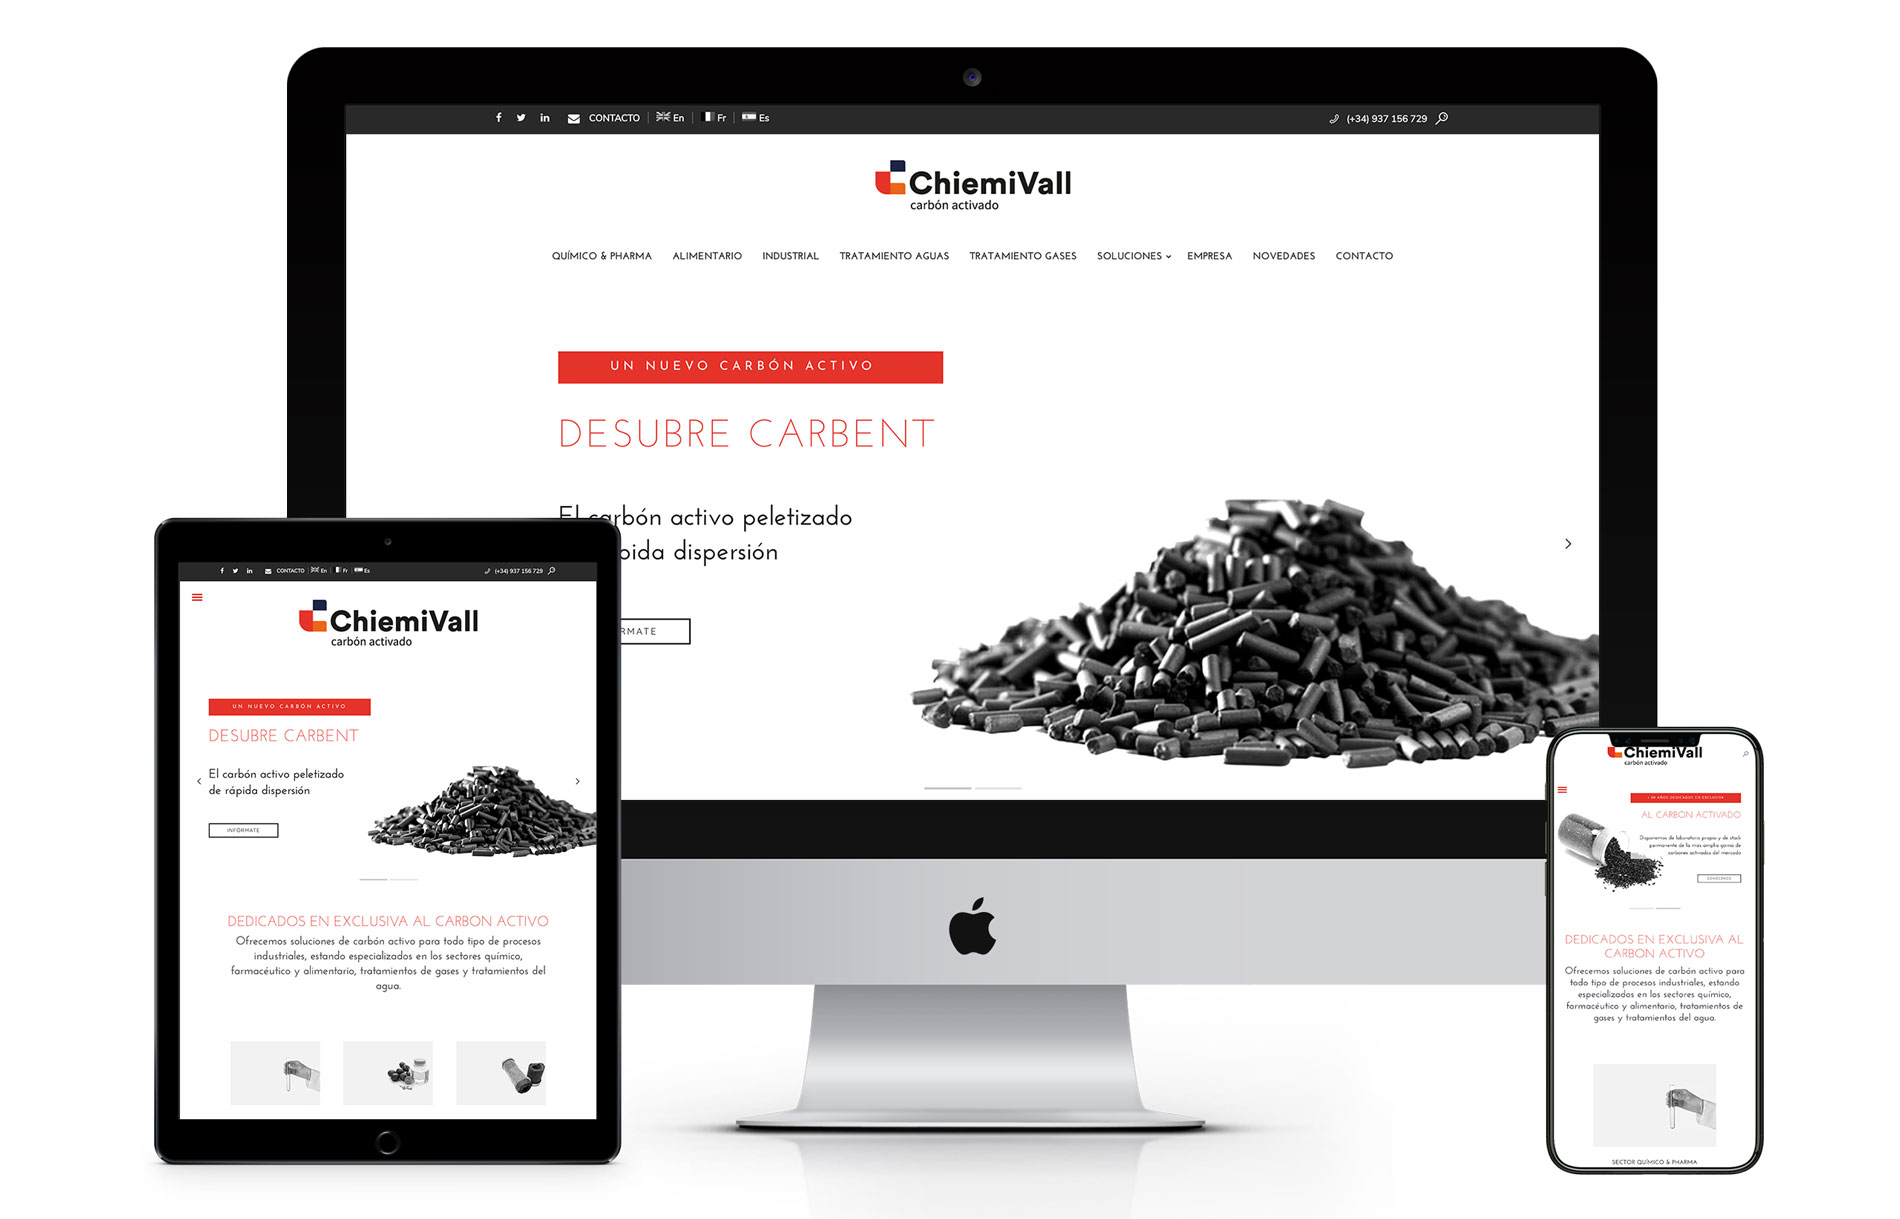 Web Chiemivall - Diseño web ChiemiVall